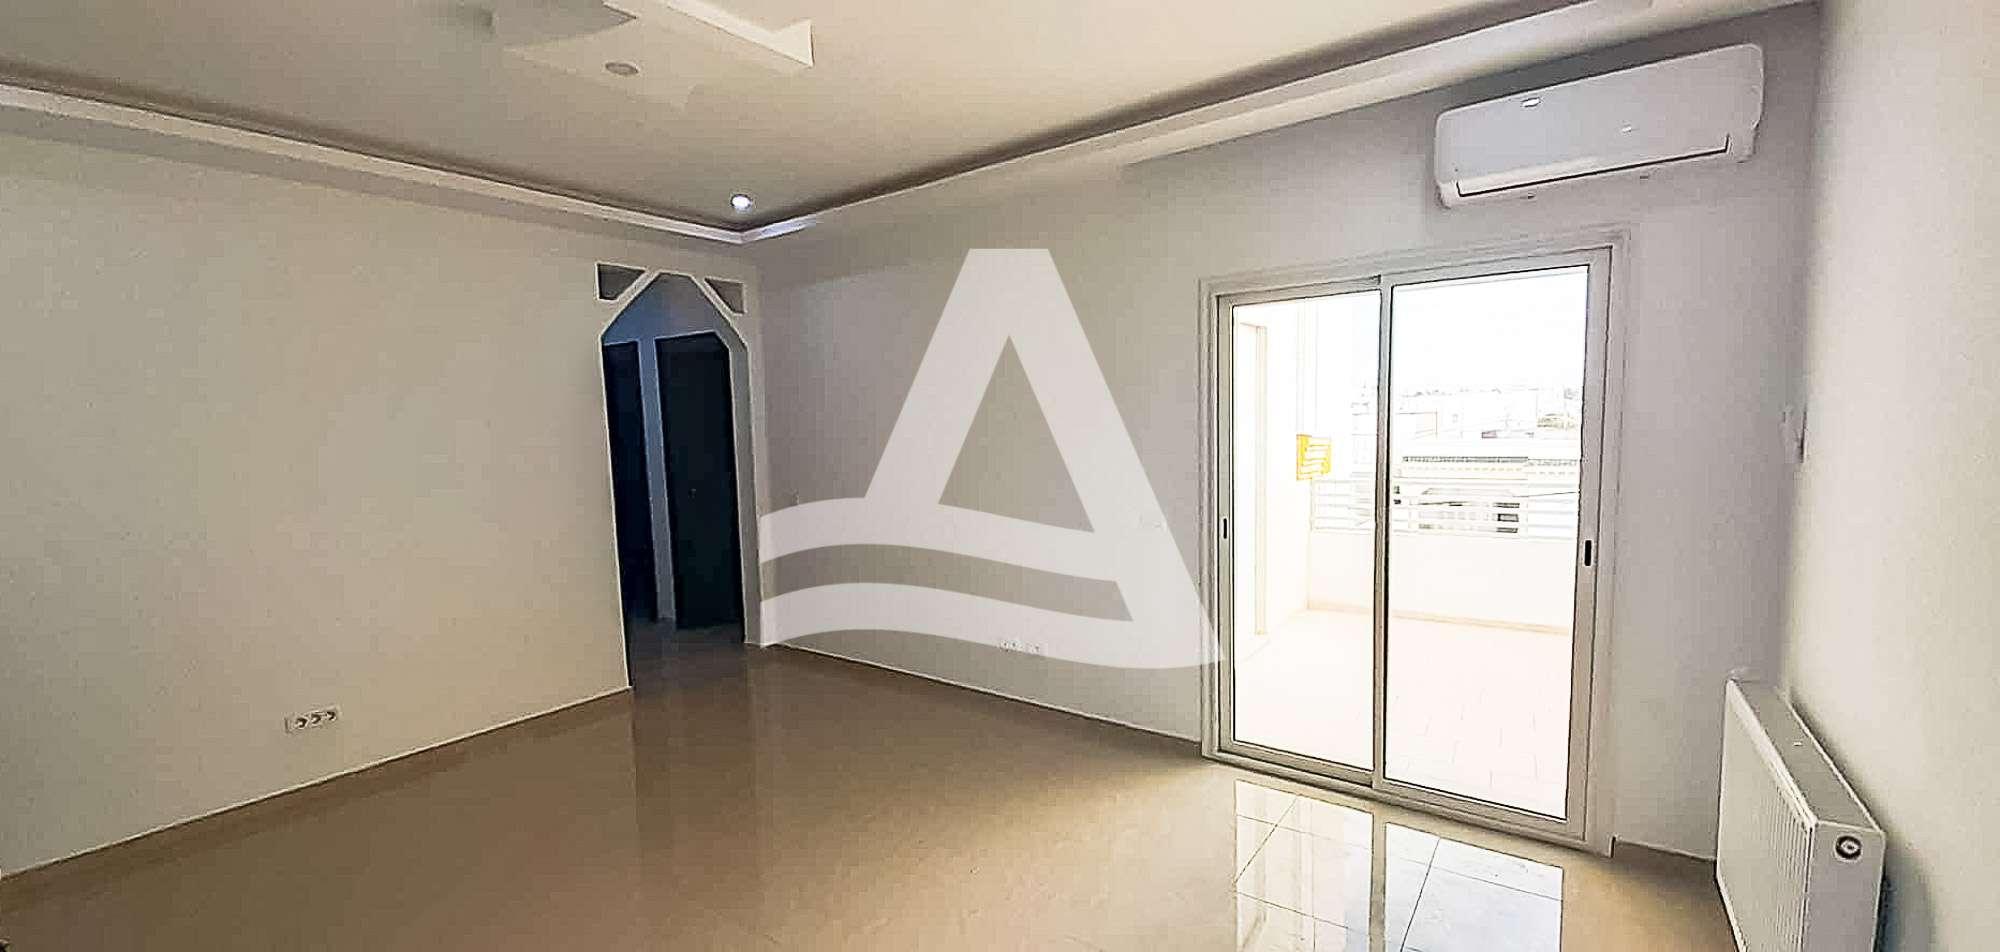 httpss3.amazonaws.comlogimoaws_Arcane_immobilière_la_Marsa-_location_-_vente_la_marsa_1_sur_9_1574175647990